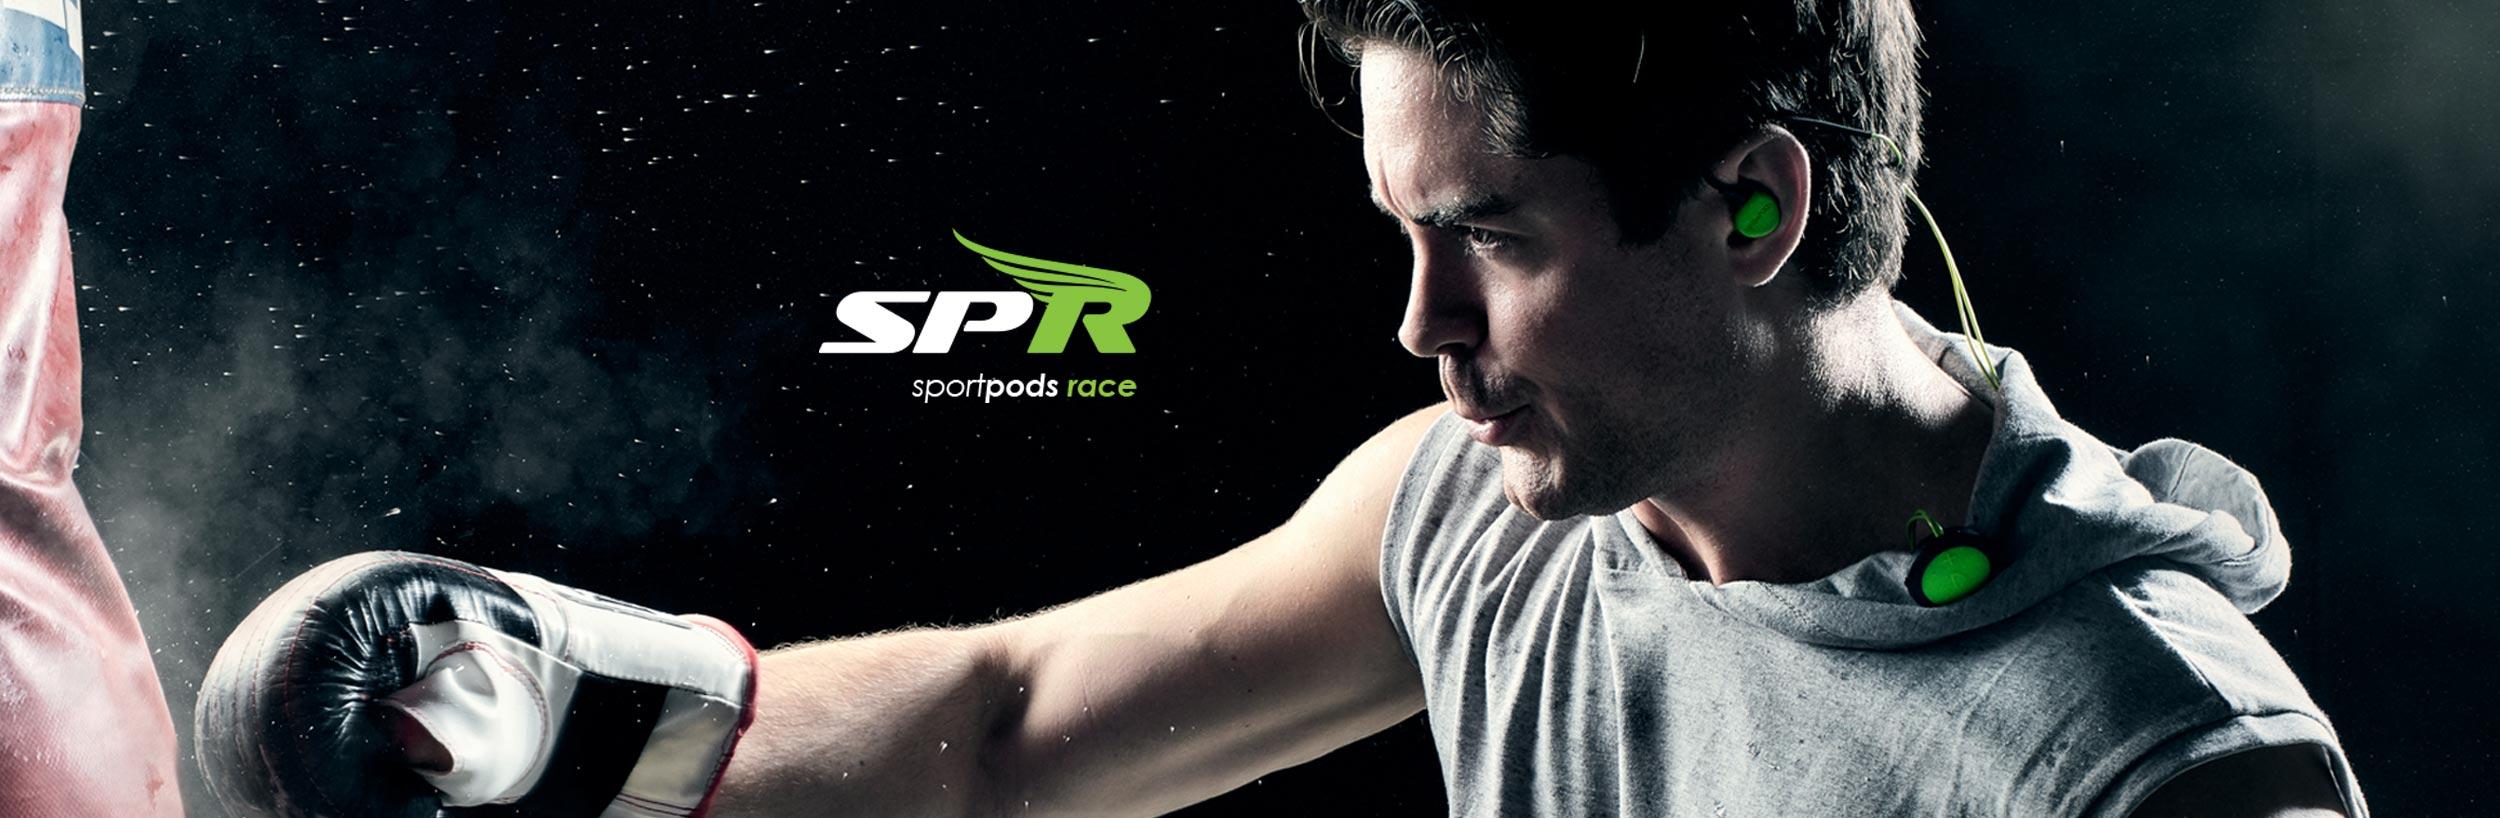 Boompods Sportpods Race